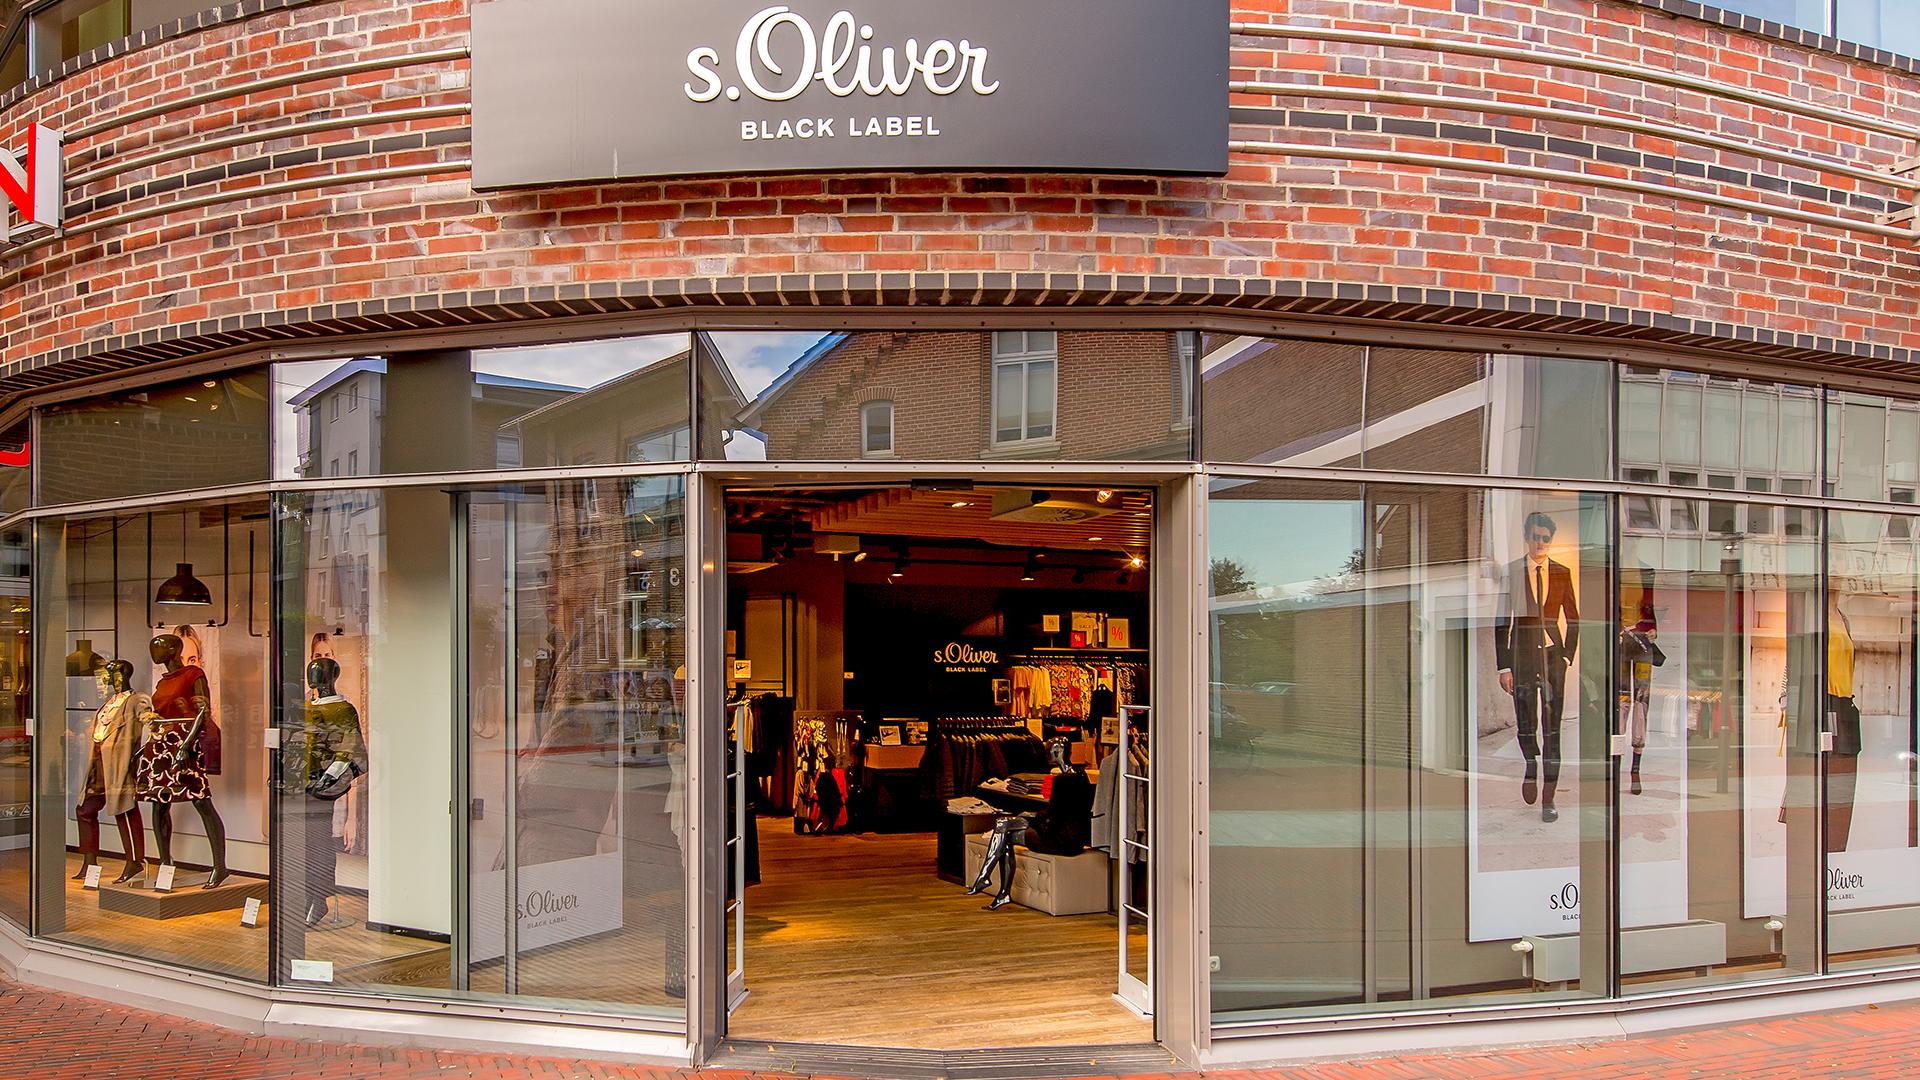 sale retailer 629b2 0b151 S.Oliver Black Label - LOOKENTOR - Die Shopping-Galerie im ...